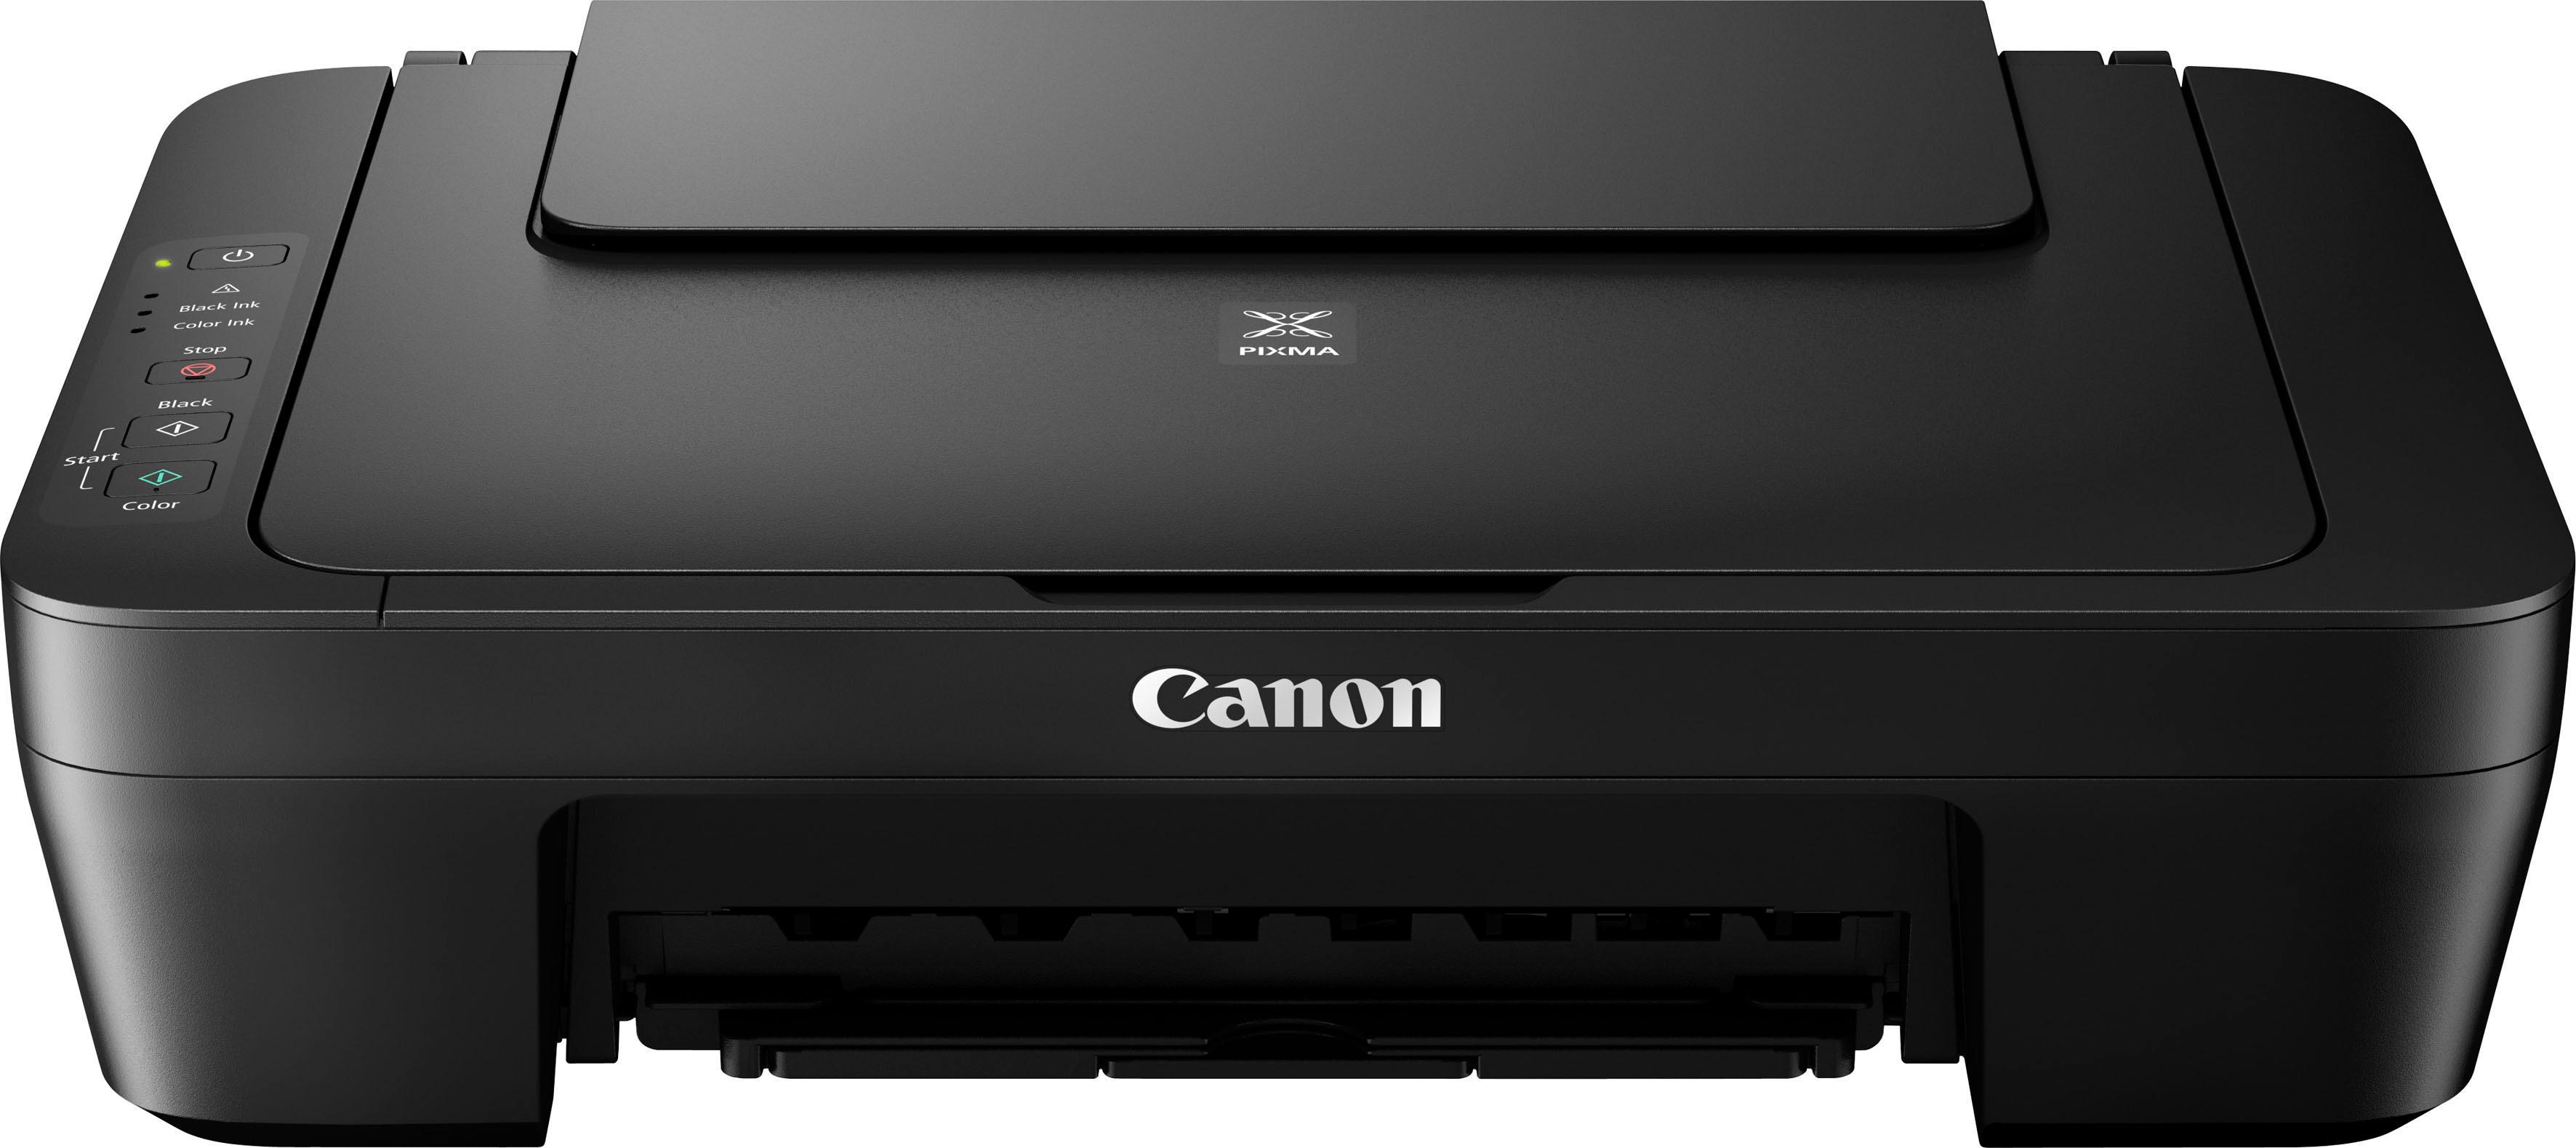 canon pixma mg2555s multifunktionsdrucker auf rechnung. Black Bedroom Furniture Sets. Home Design Ideas